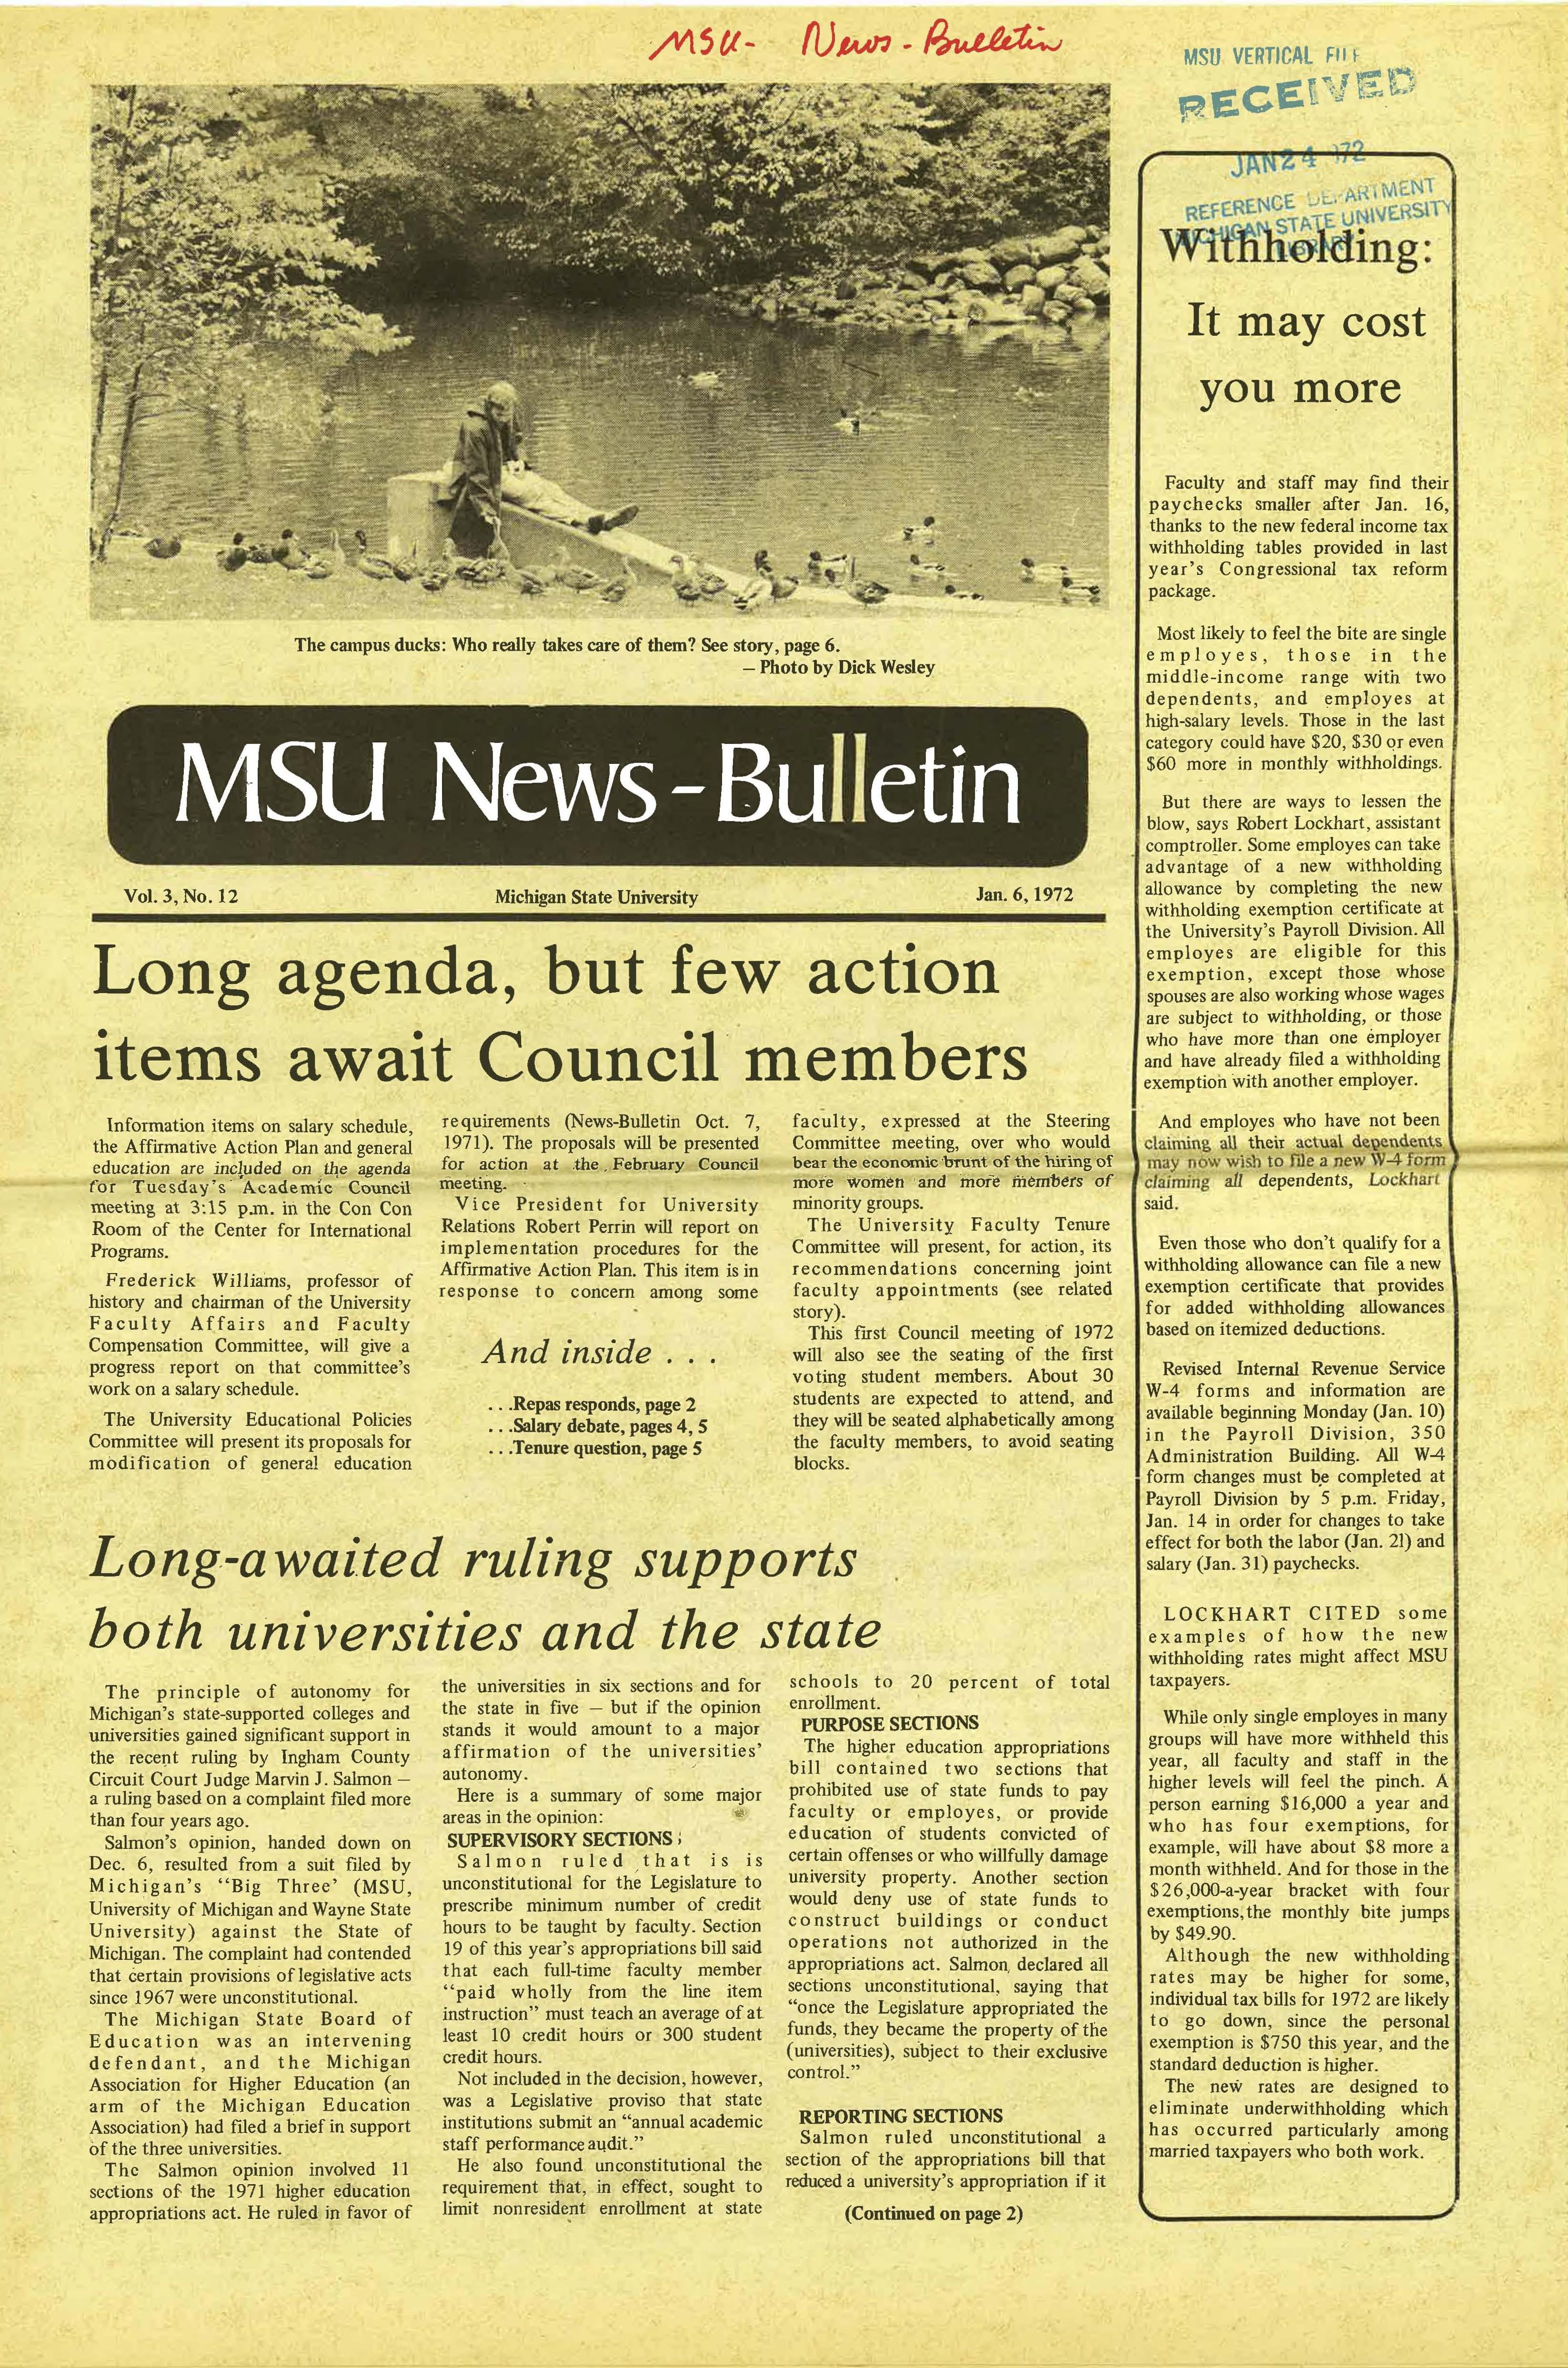 MSU News Bulletin, vol. 4, No. 03, October 5, 1972